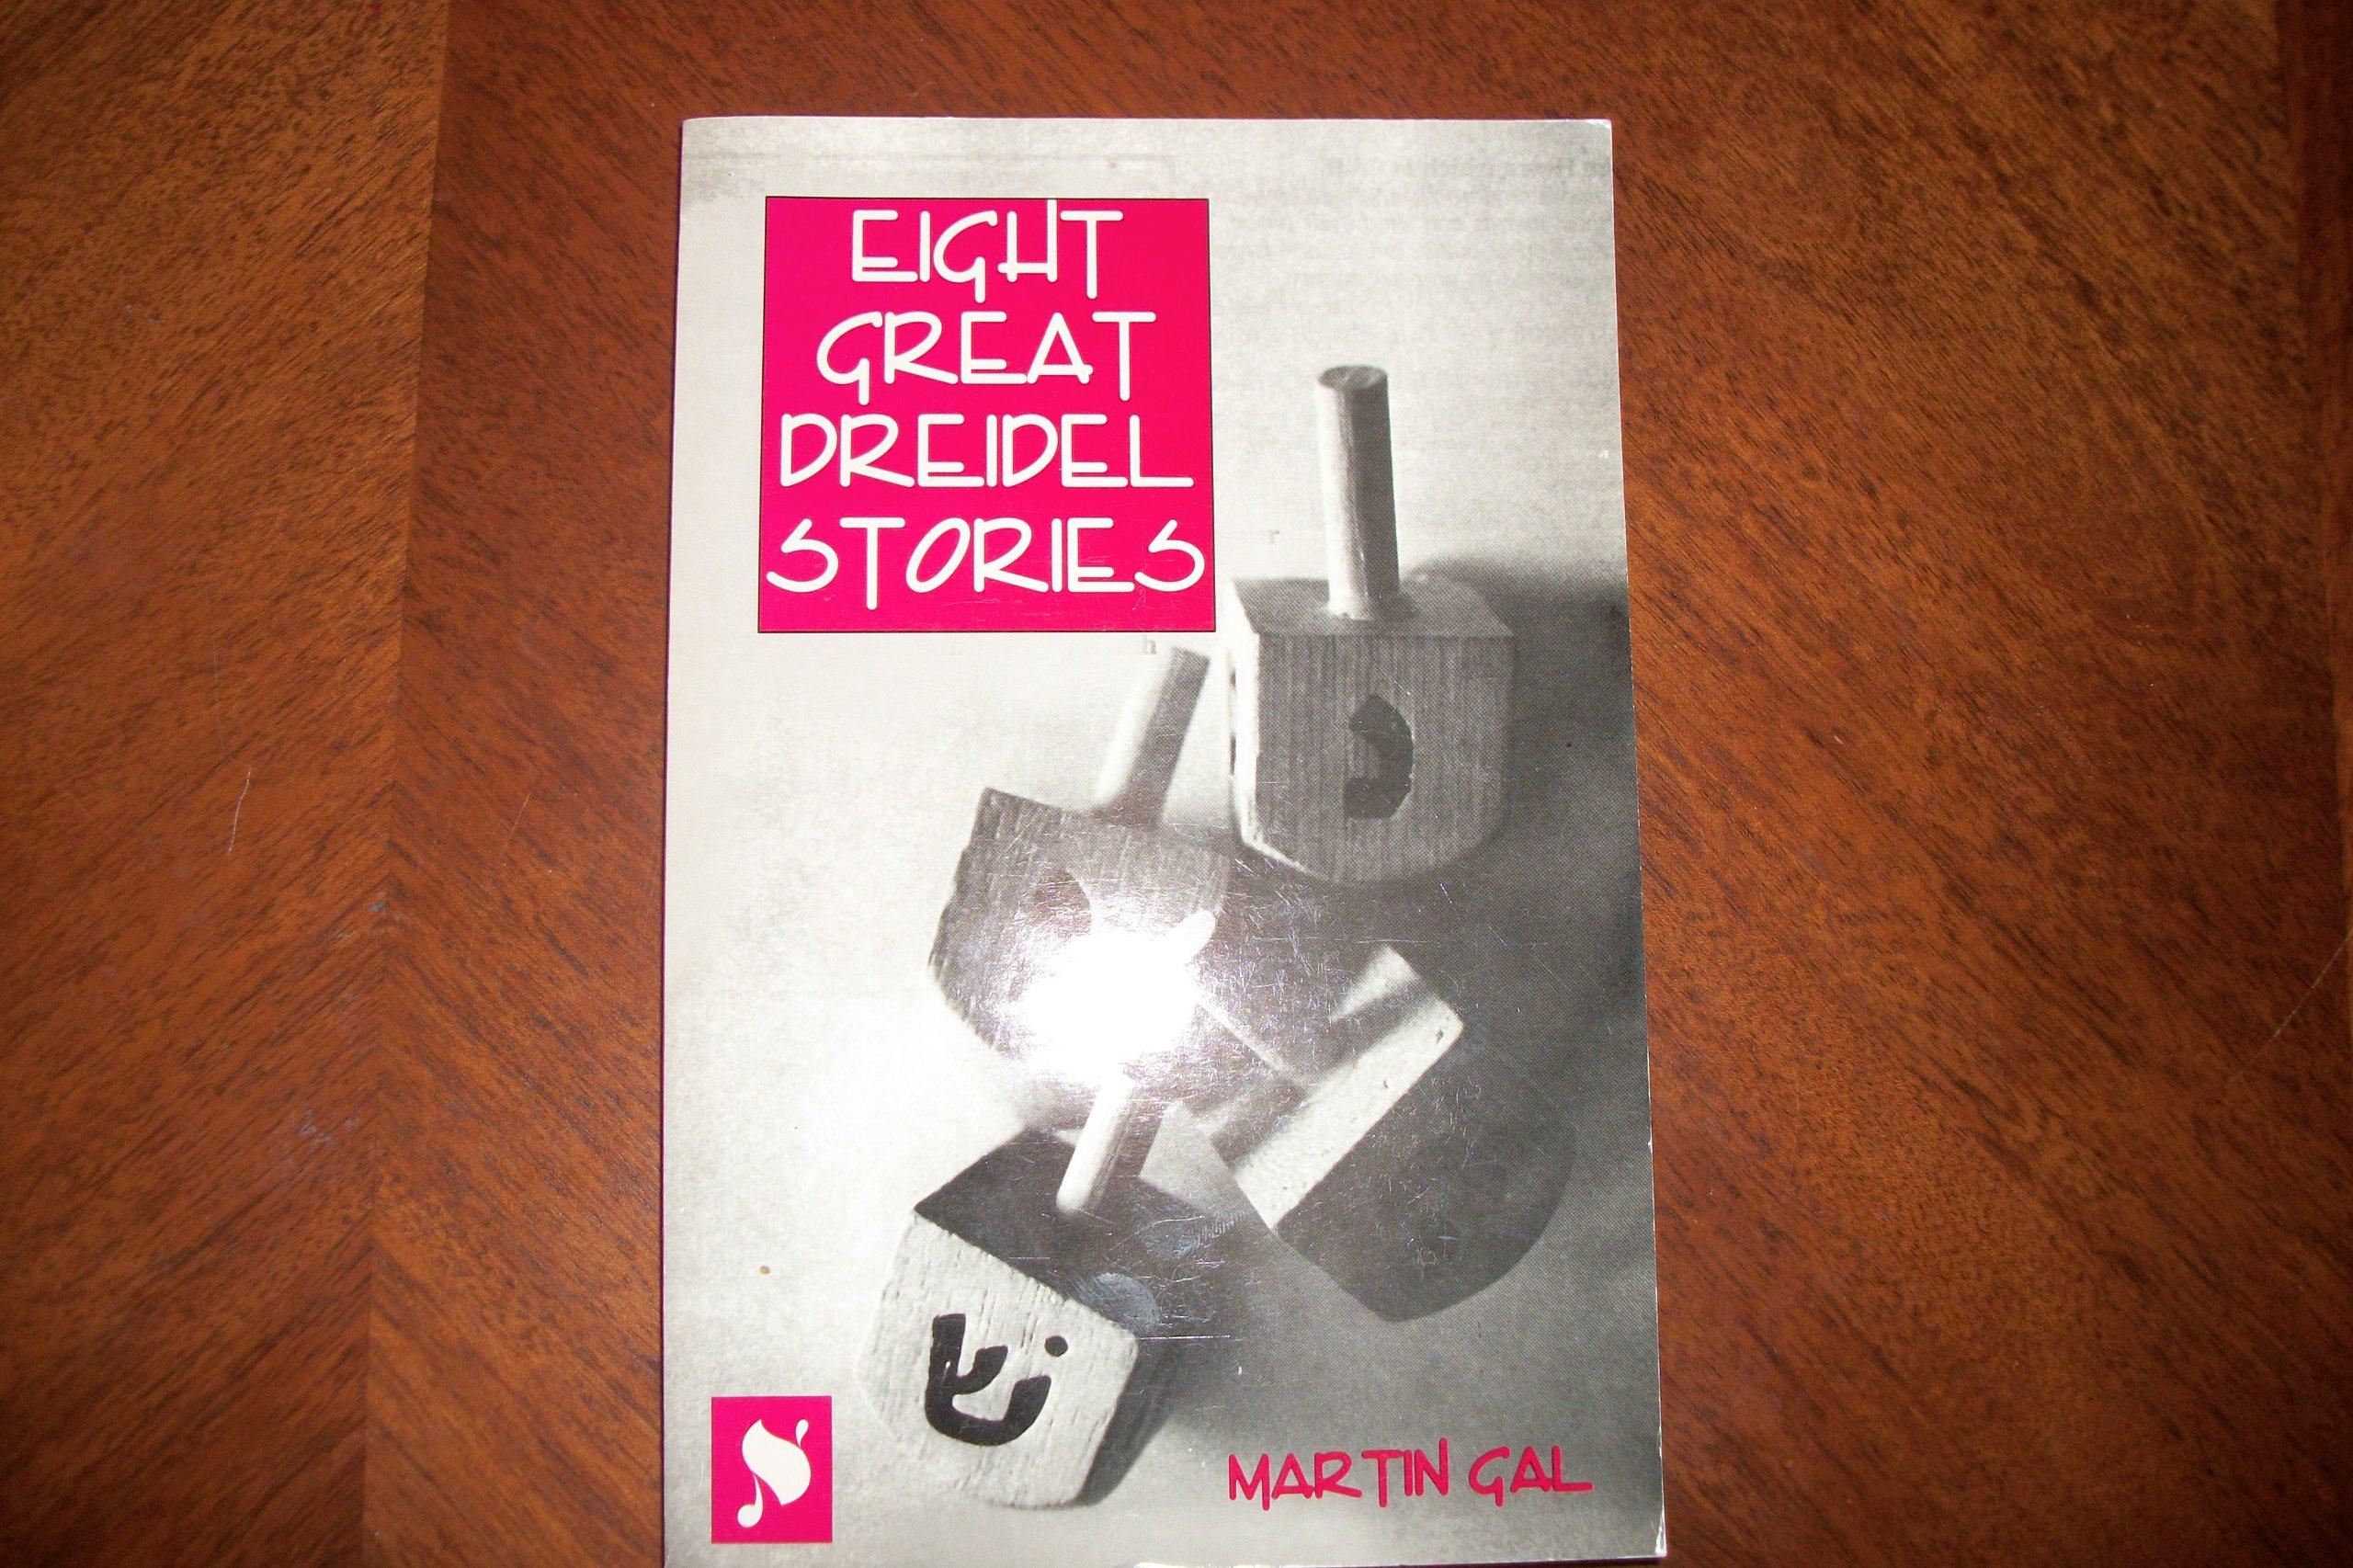 Eight Great Dreidel Stories